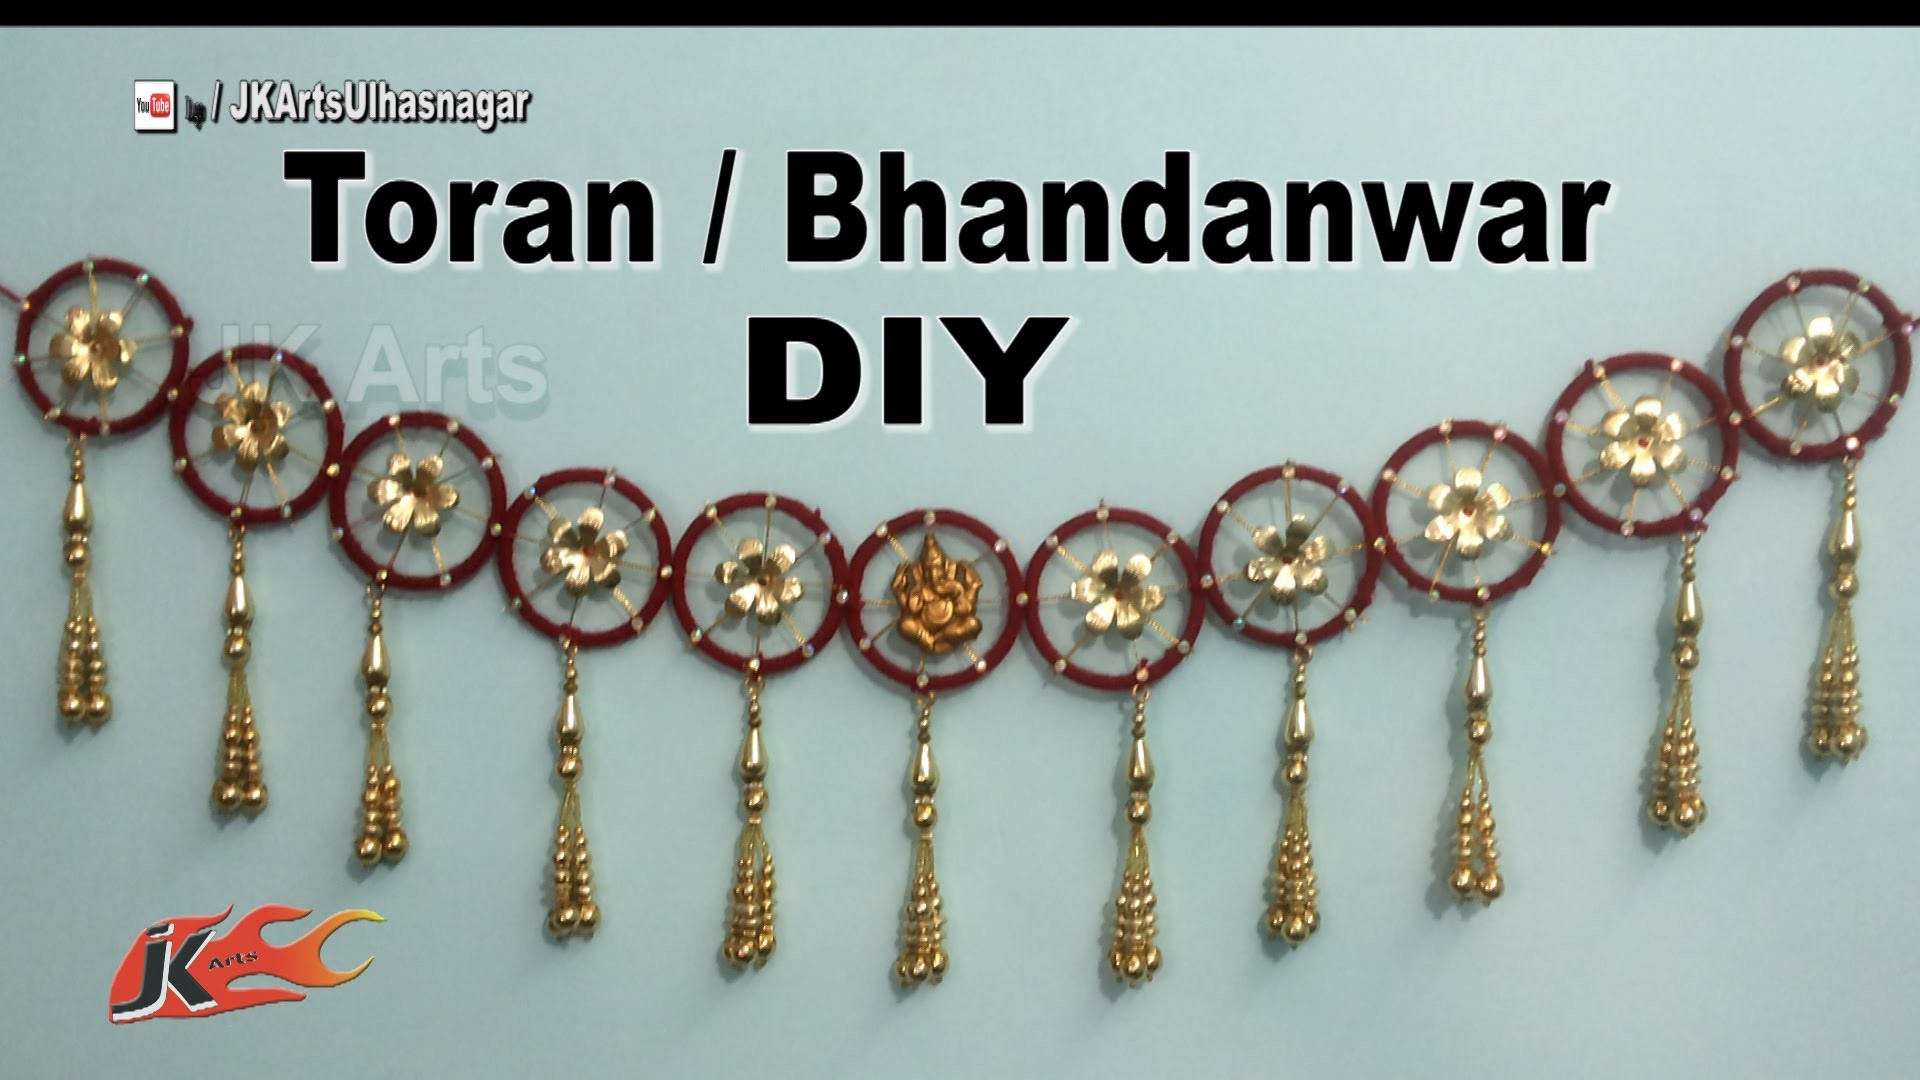 Diy toran bandhanwar from waste bangles how to make jk for Craft using waste bangles